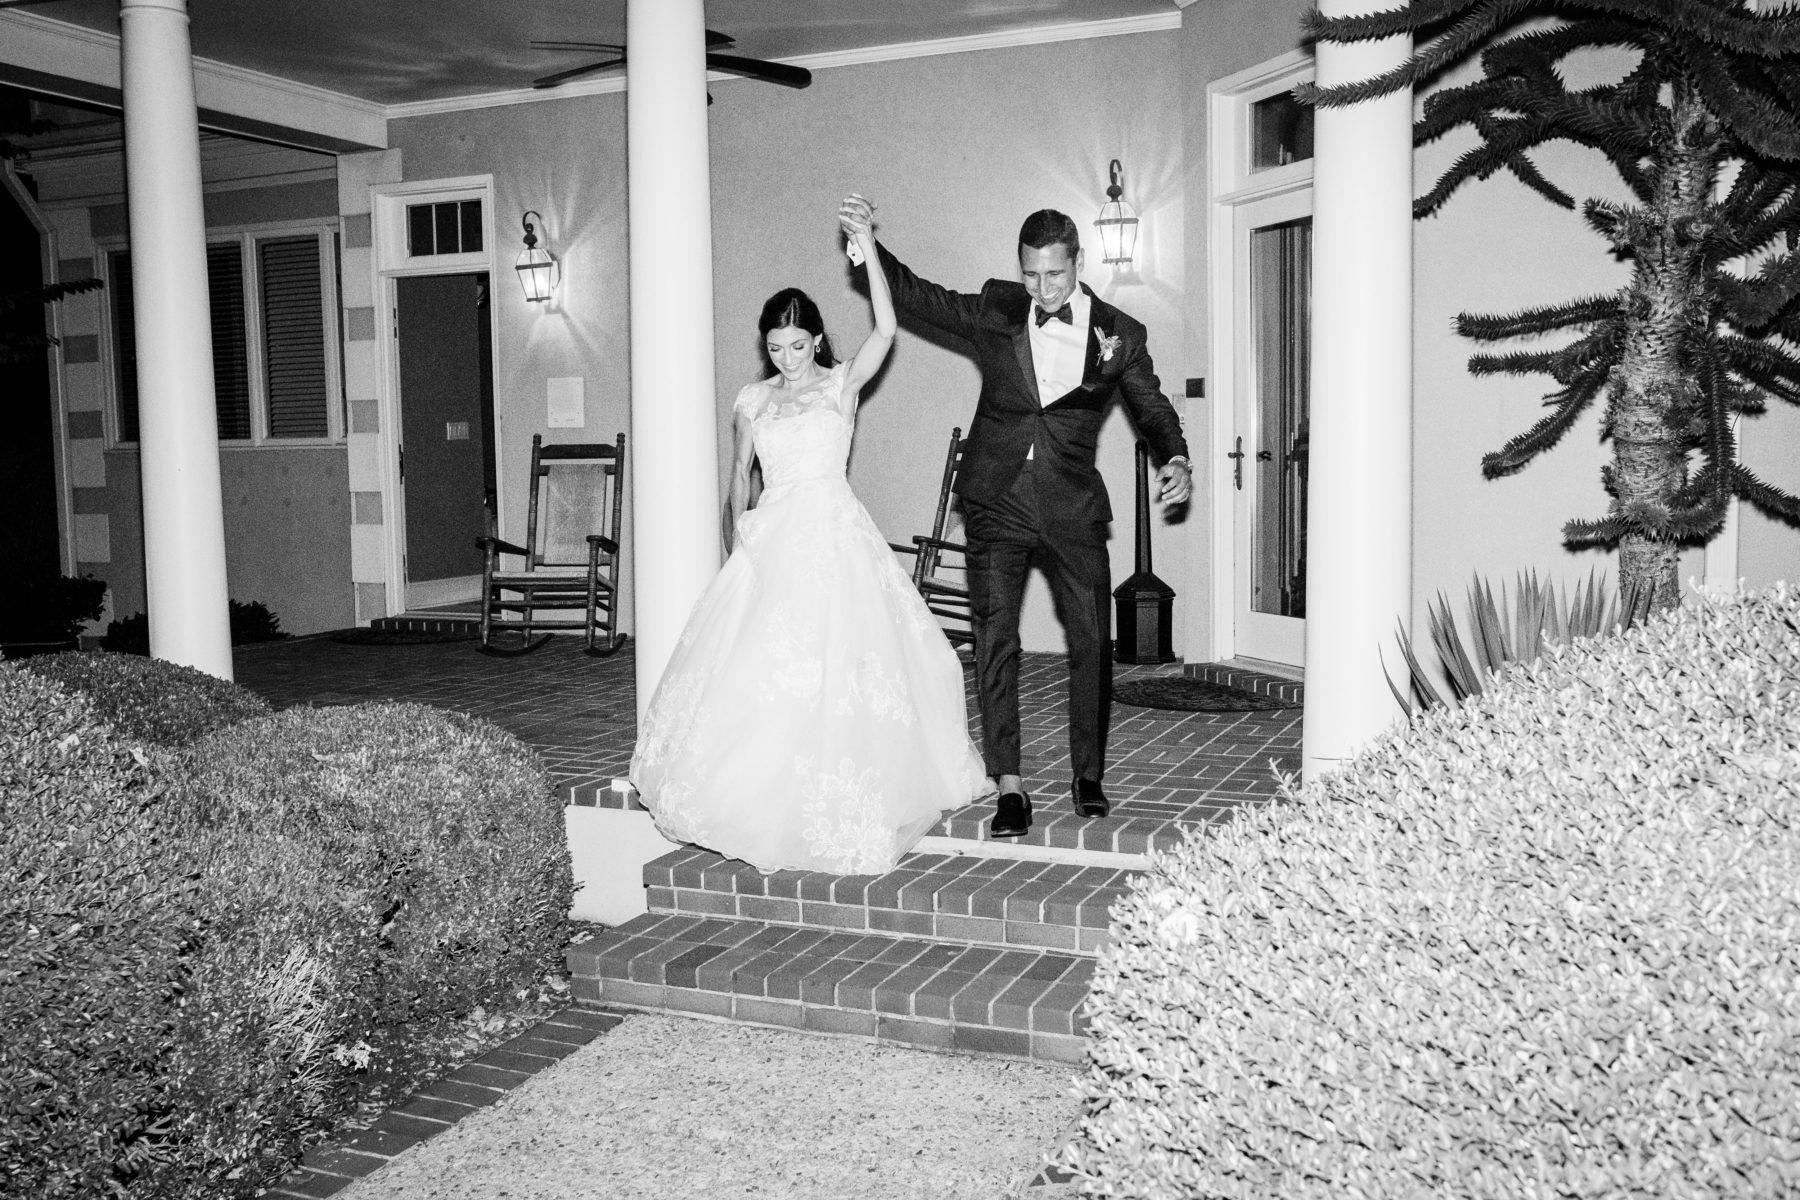 Wedding entrance to wedding reception at Autumn Crest Farm